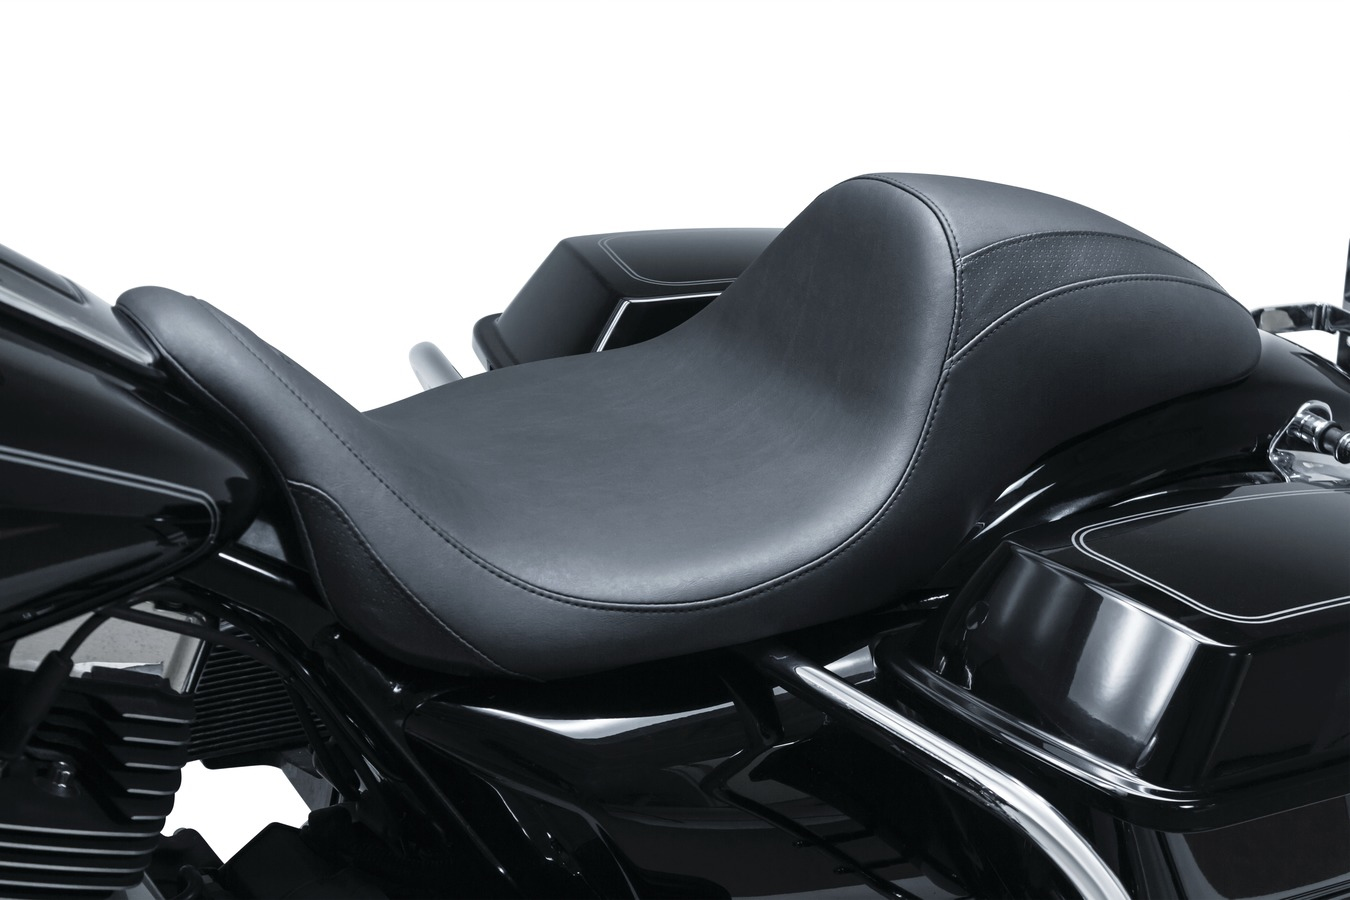 Mustang - HighTail Fastback for Harley-Davidson Dyna models 2006-2017